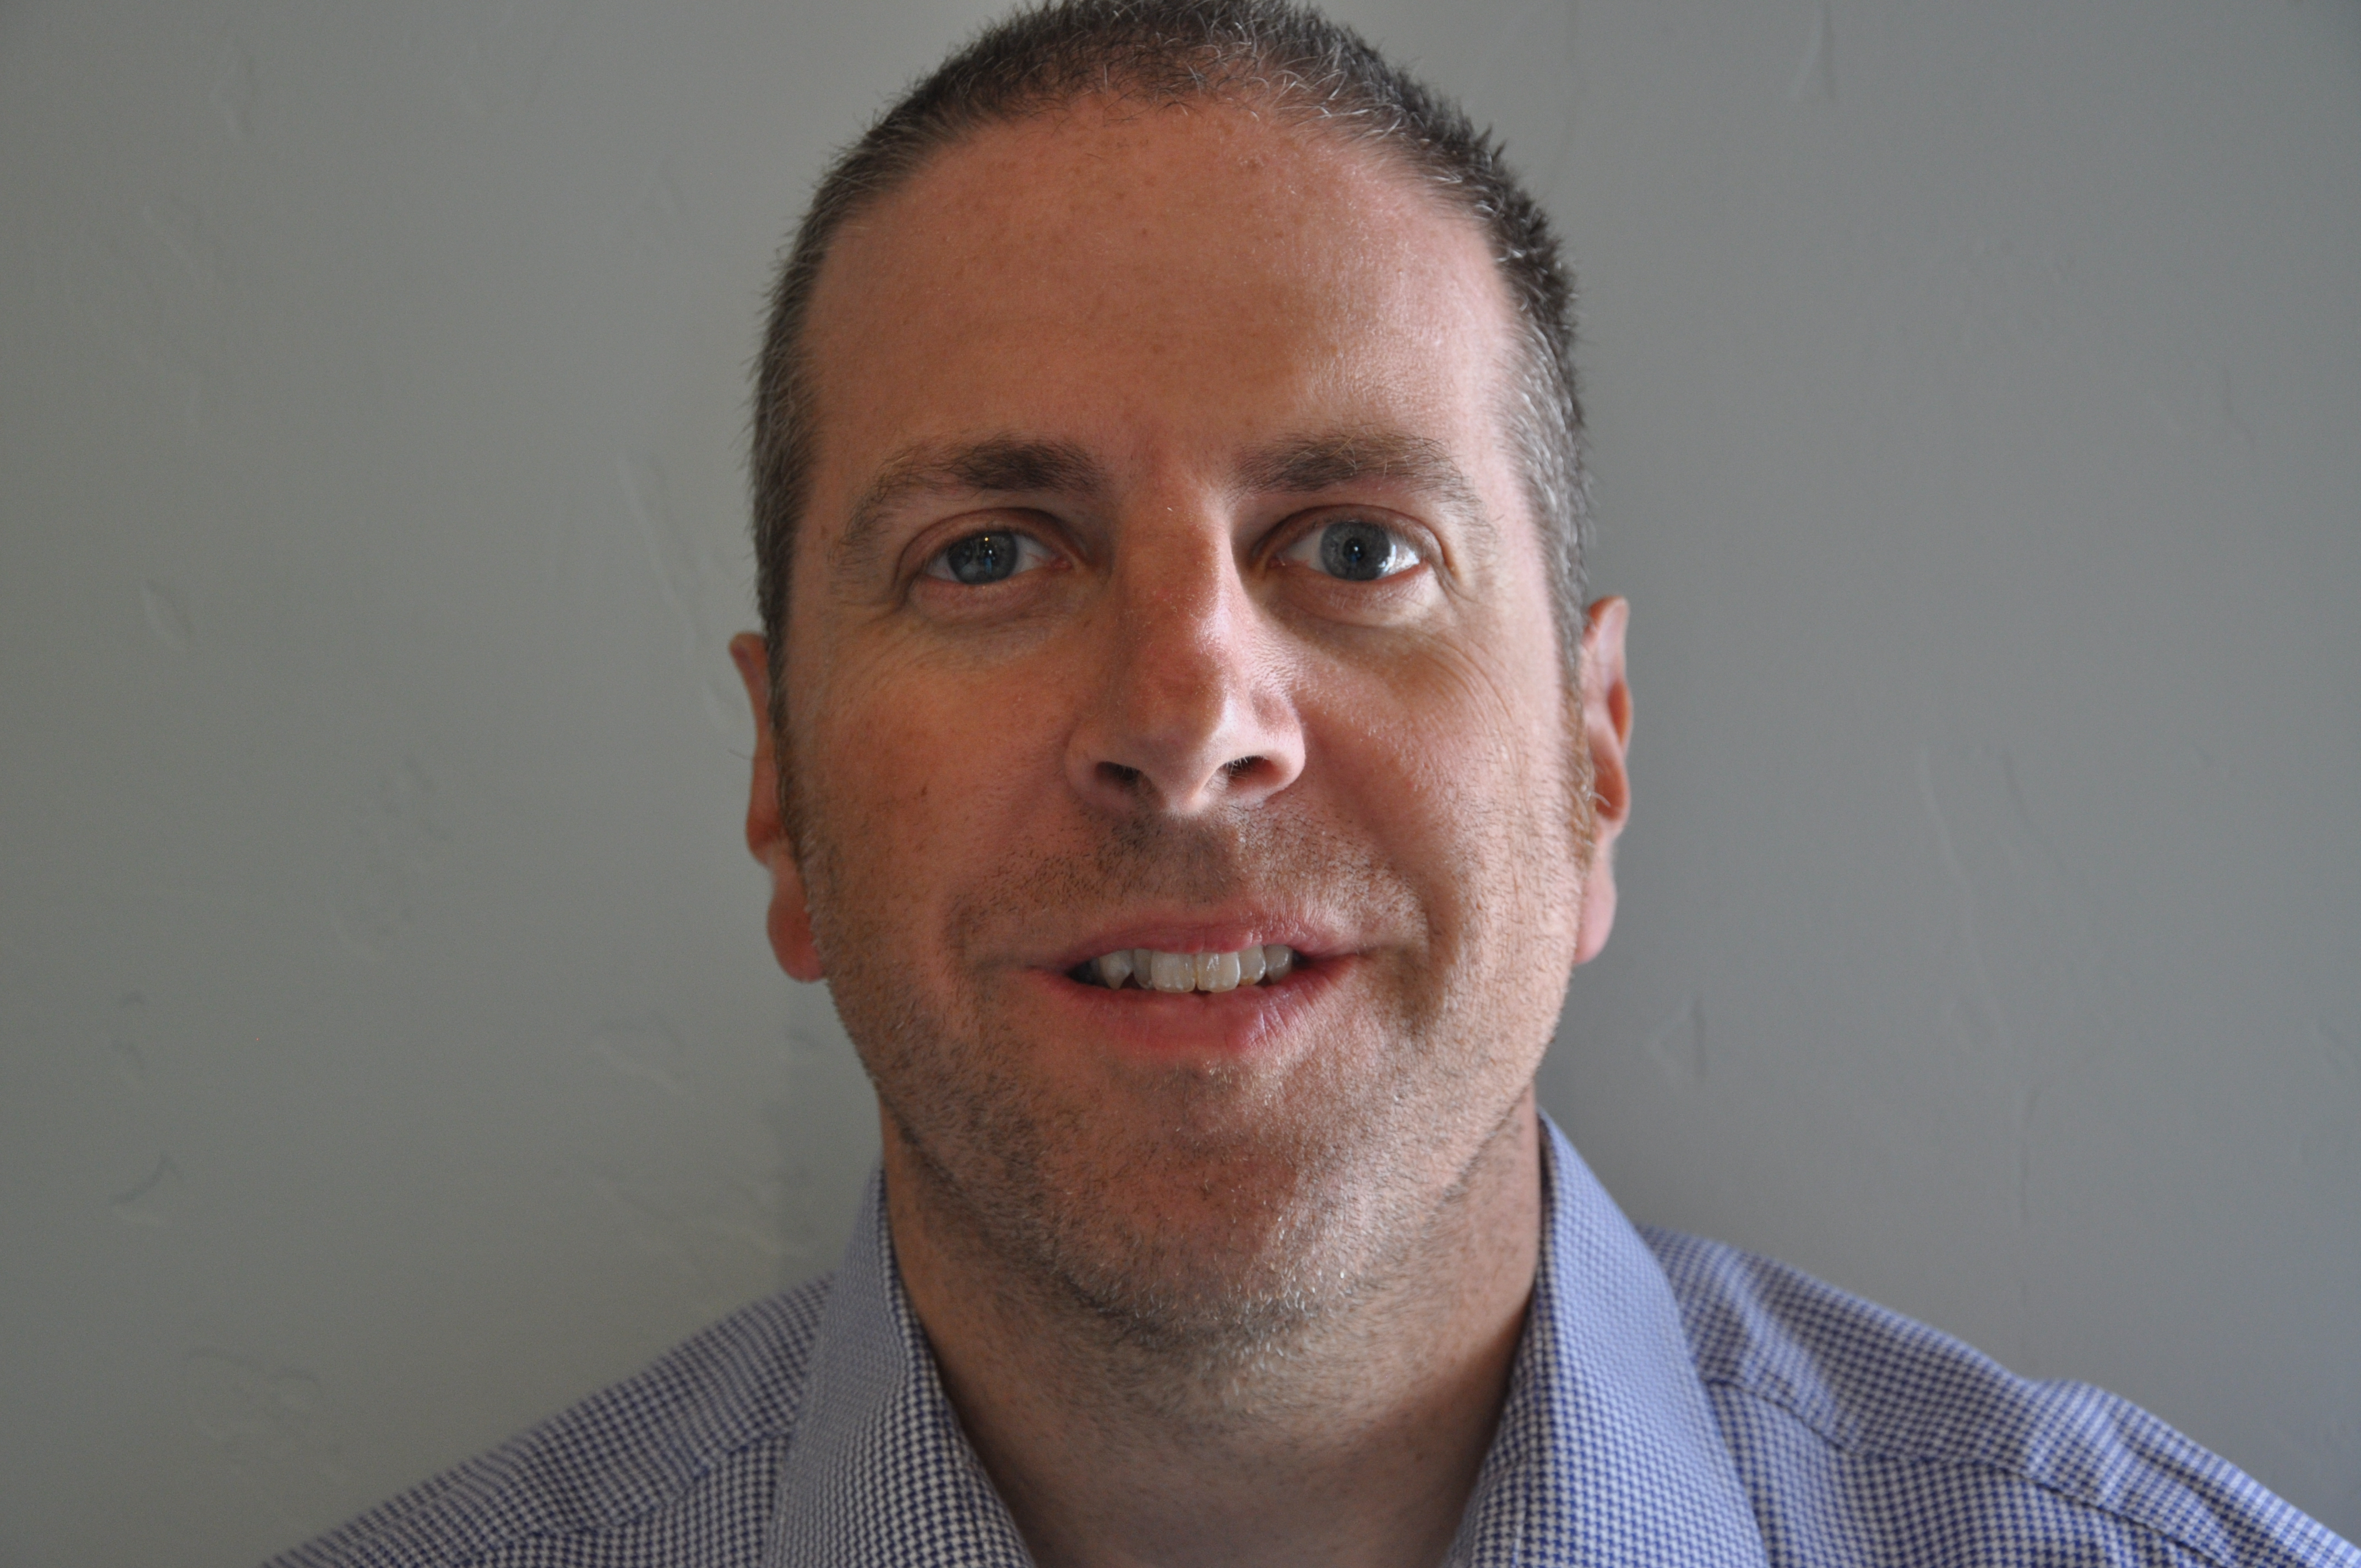 Johnson & Johnson's new tech business development guy, Marc Leibowitz